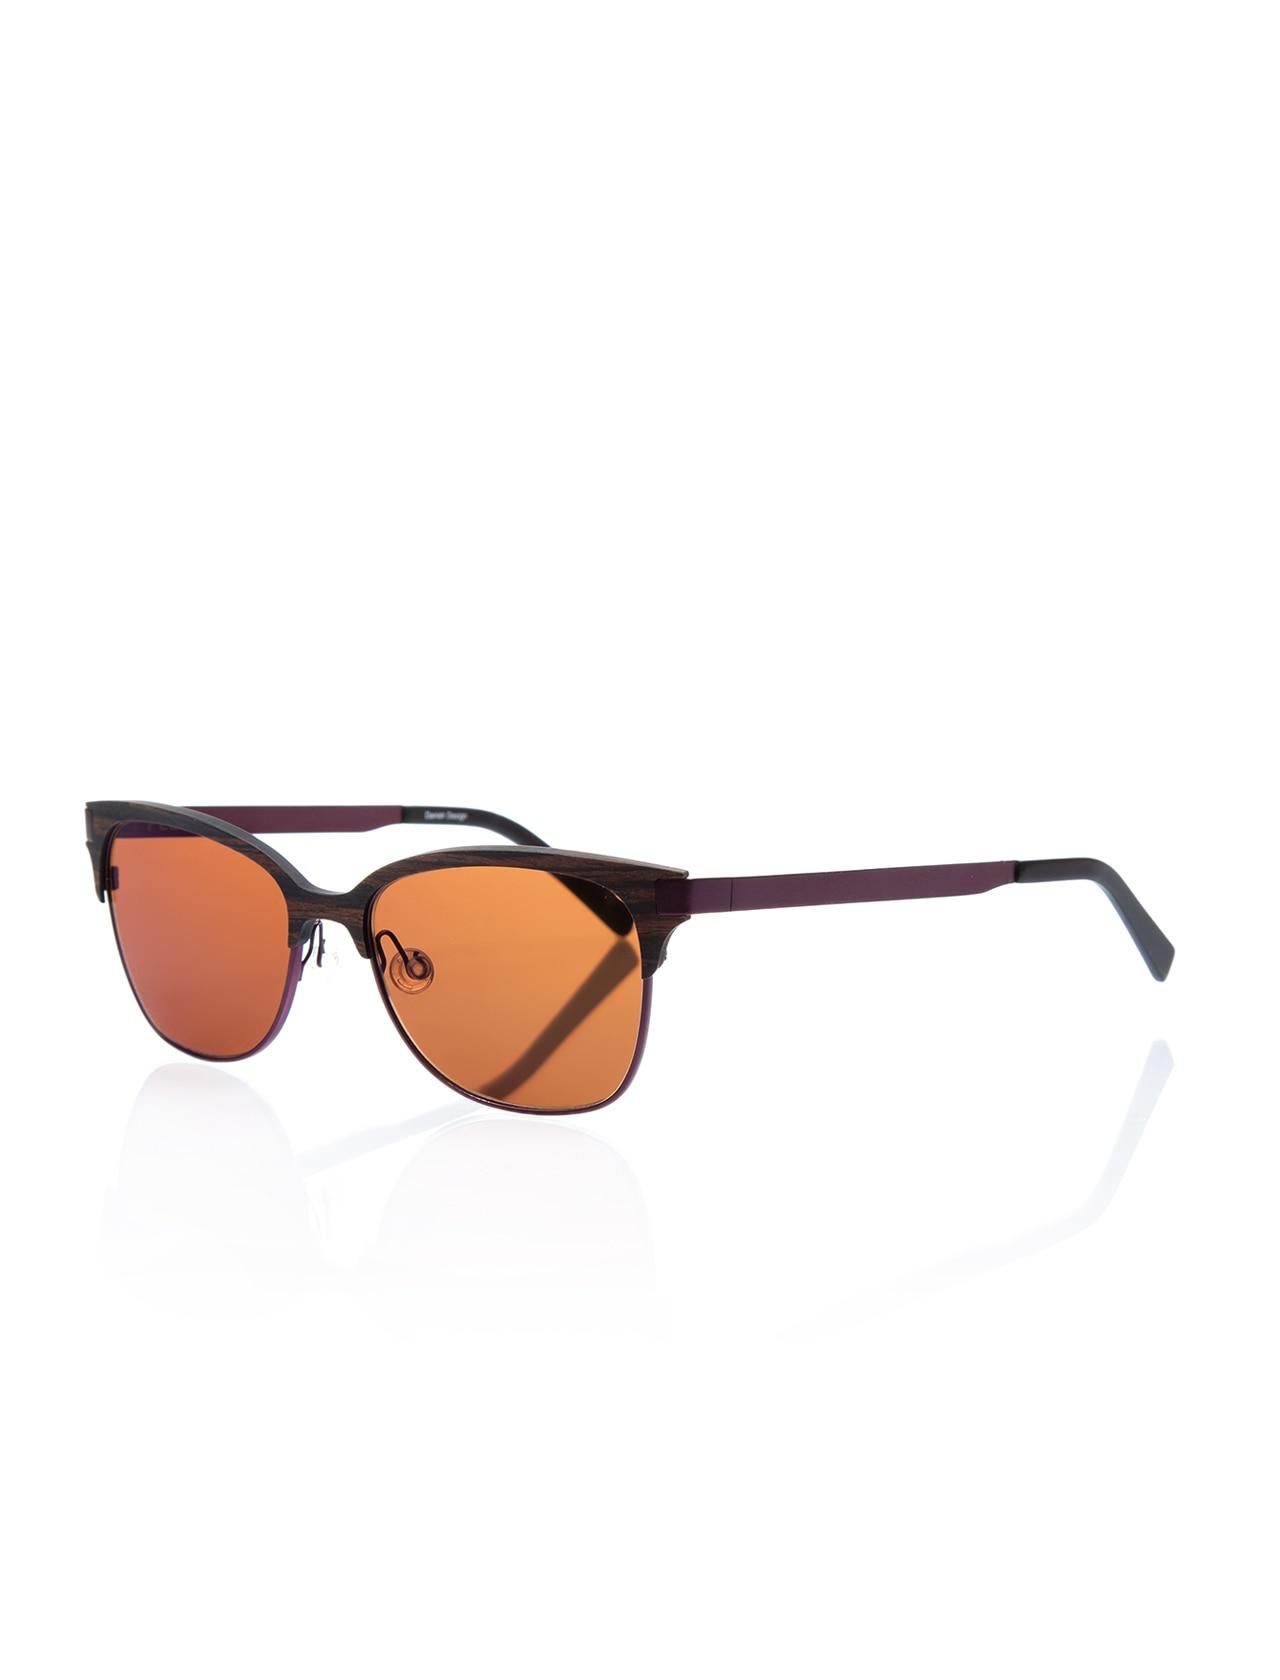 Women's sunglasses fy ena 4634 metal purple organic 53 -- fleye